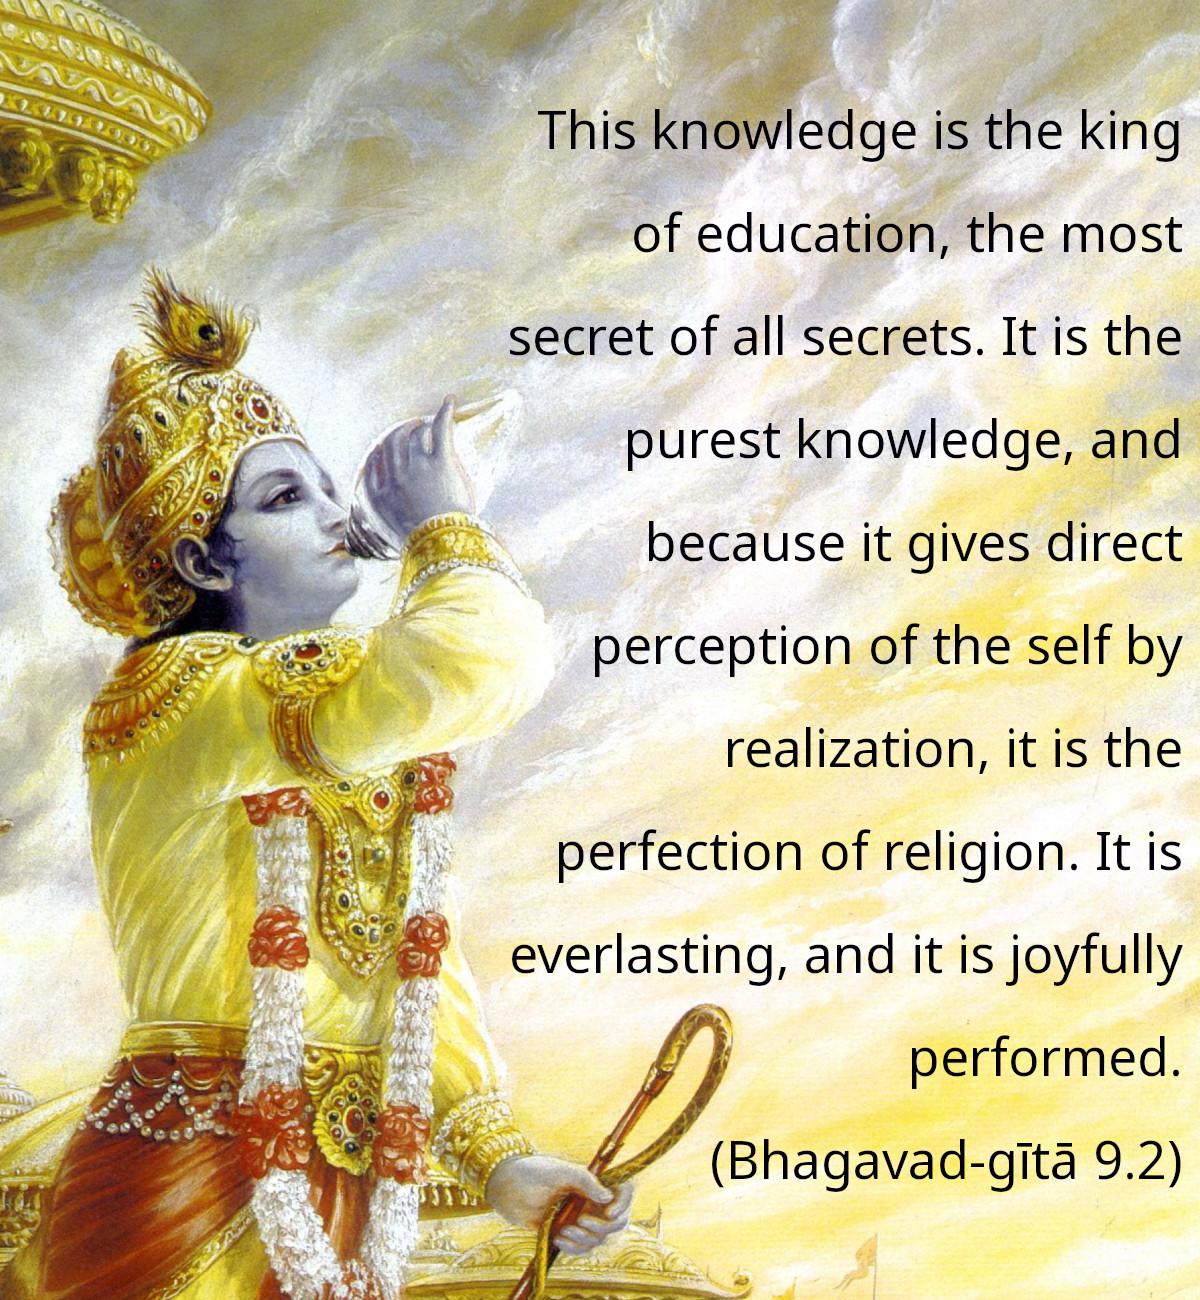 Bhagavad Gita Quotes On Education Pinterest thumbnail